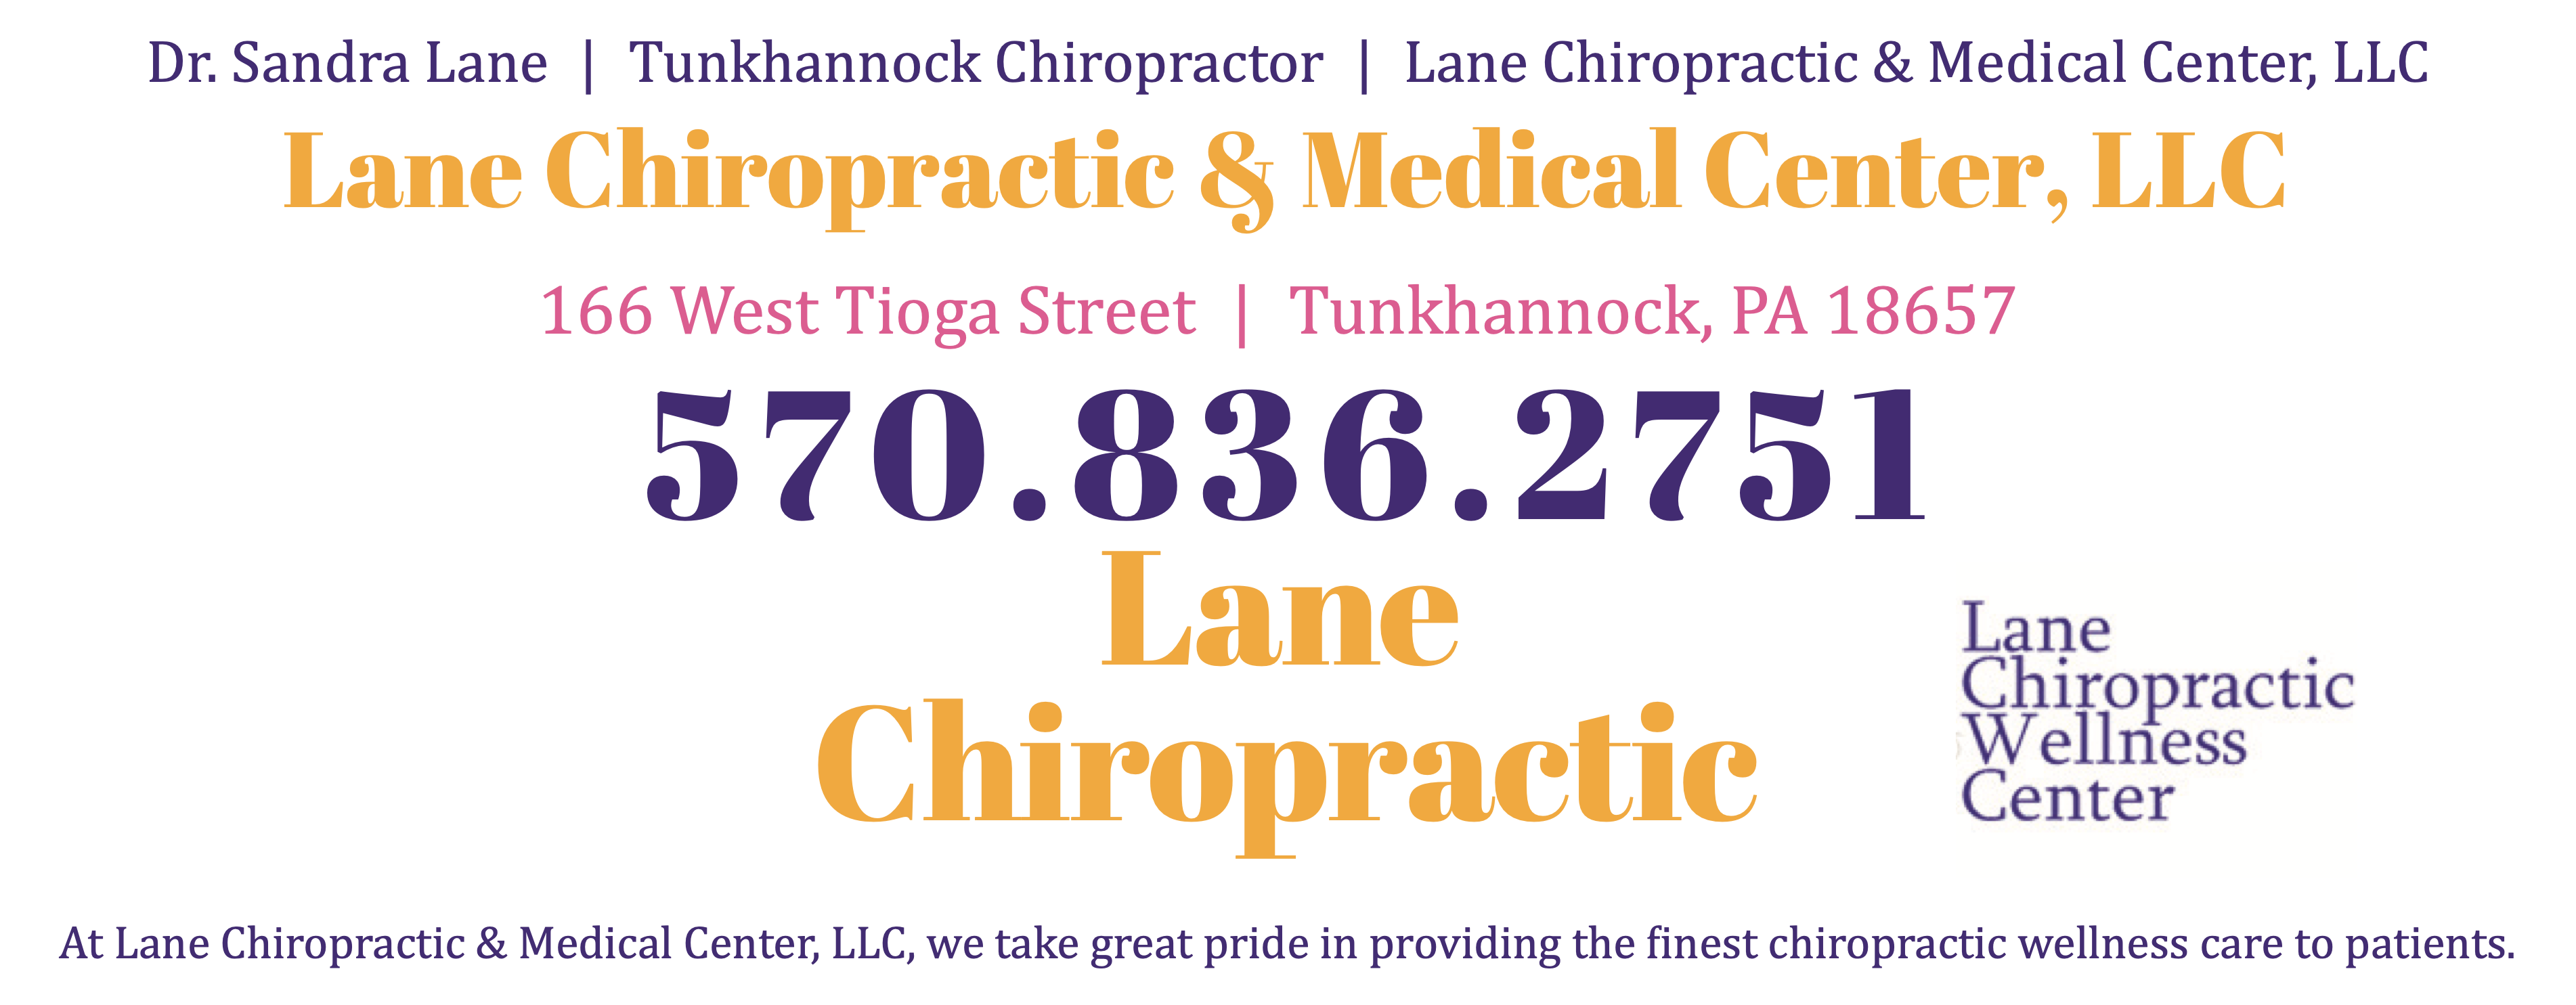 Lane Chiropractic